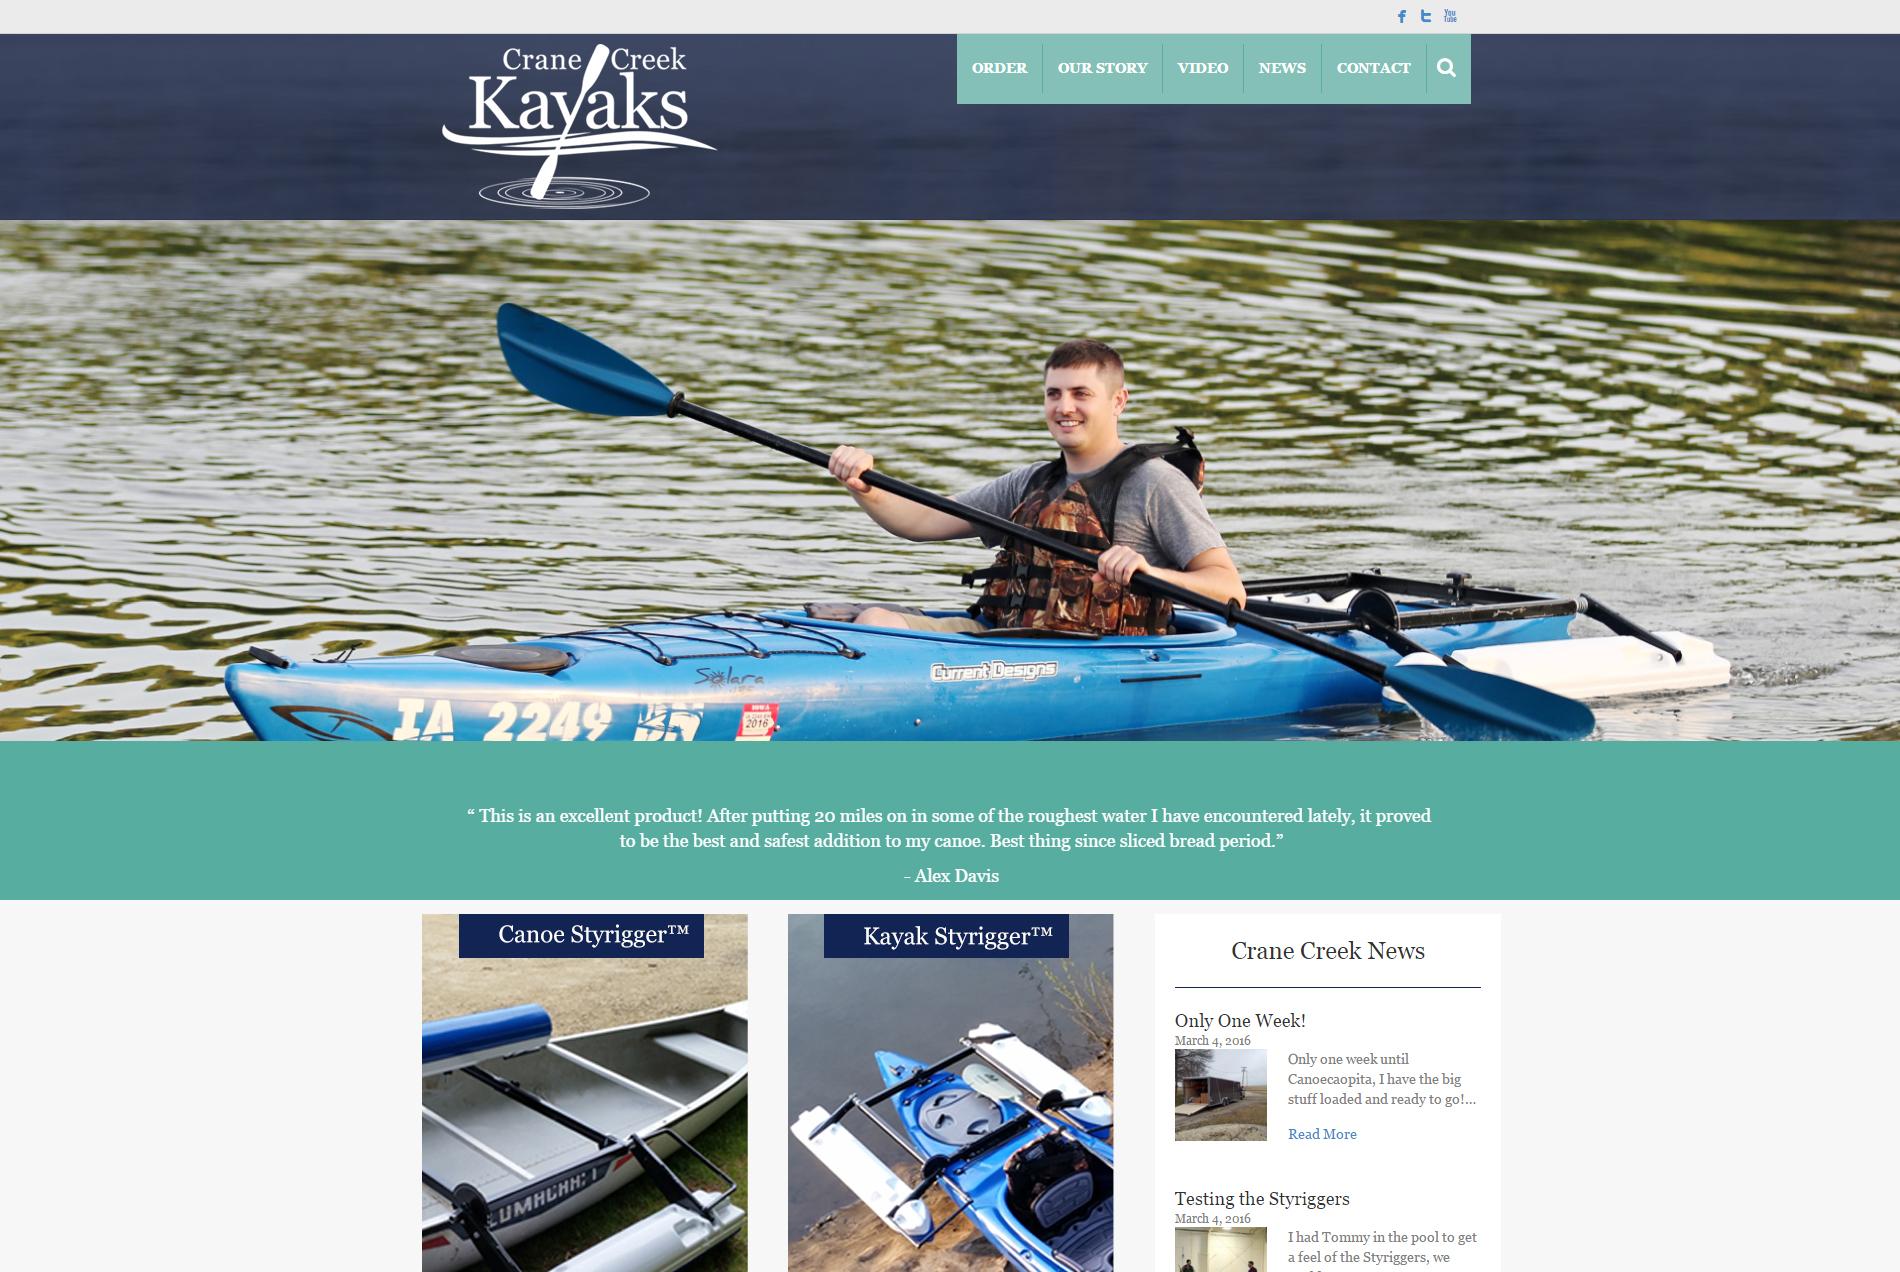 Crane Creek Kayaks - Website